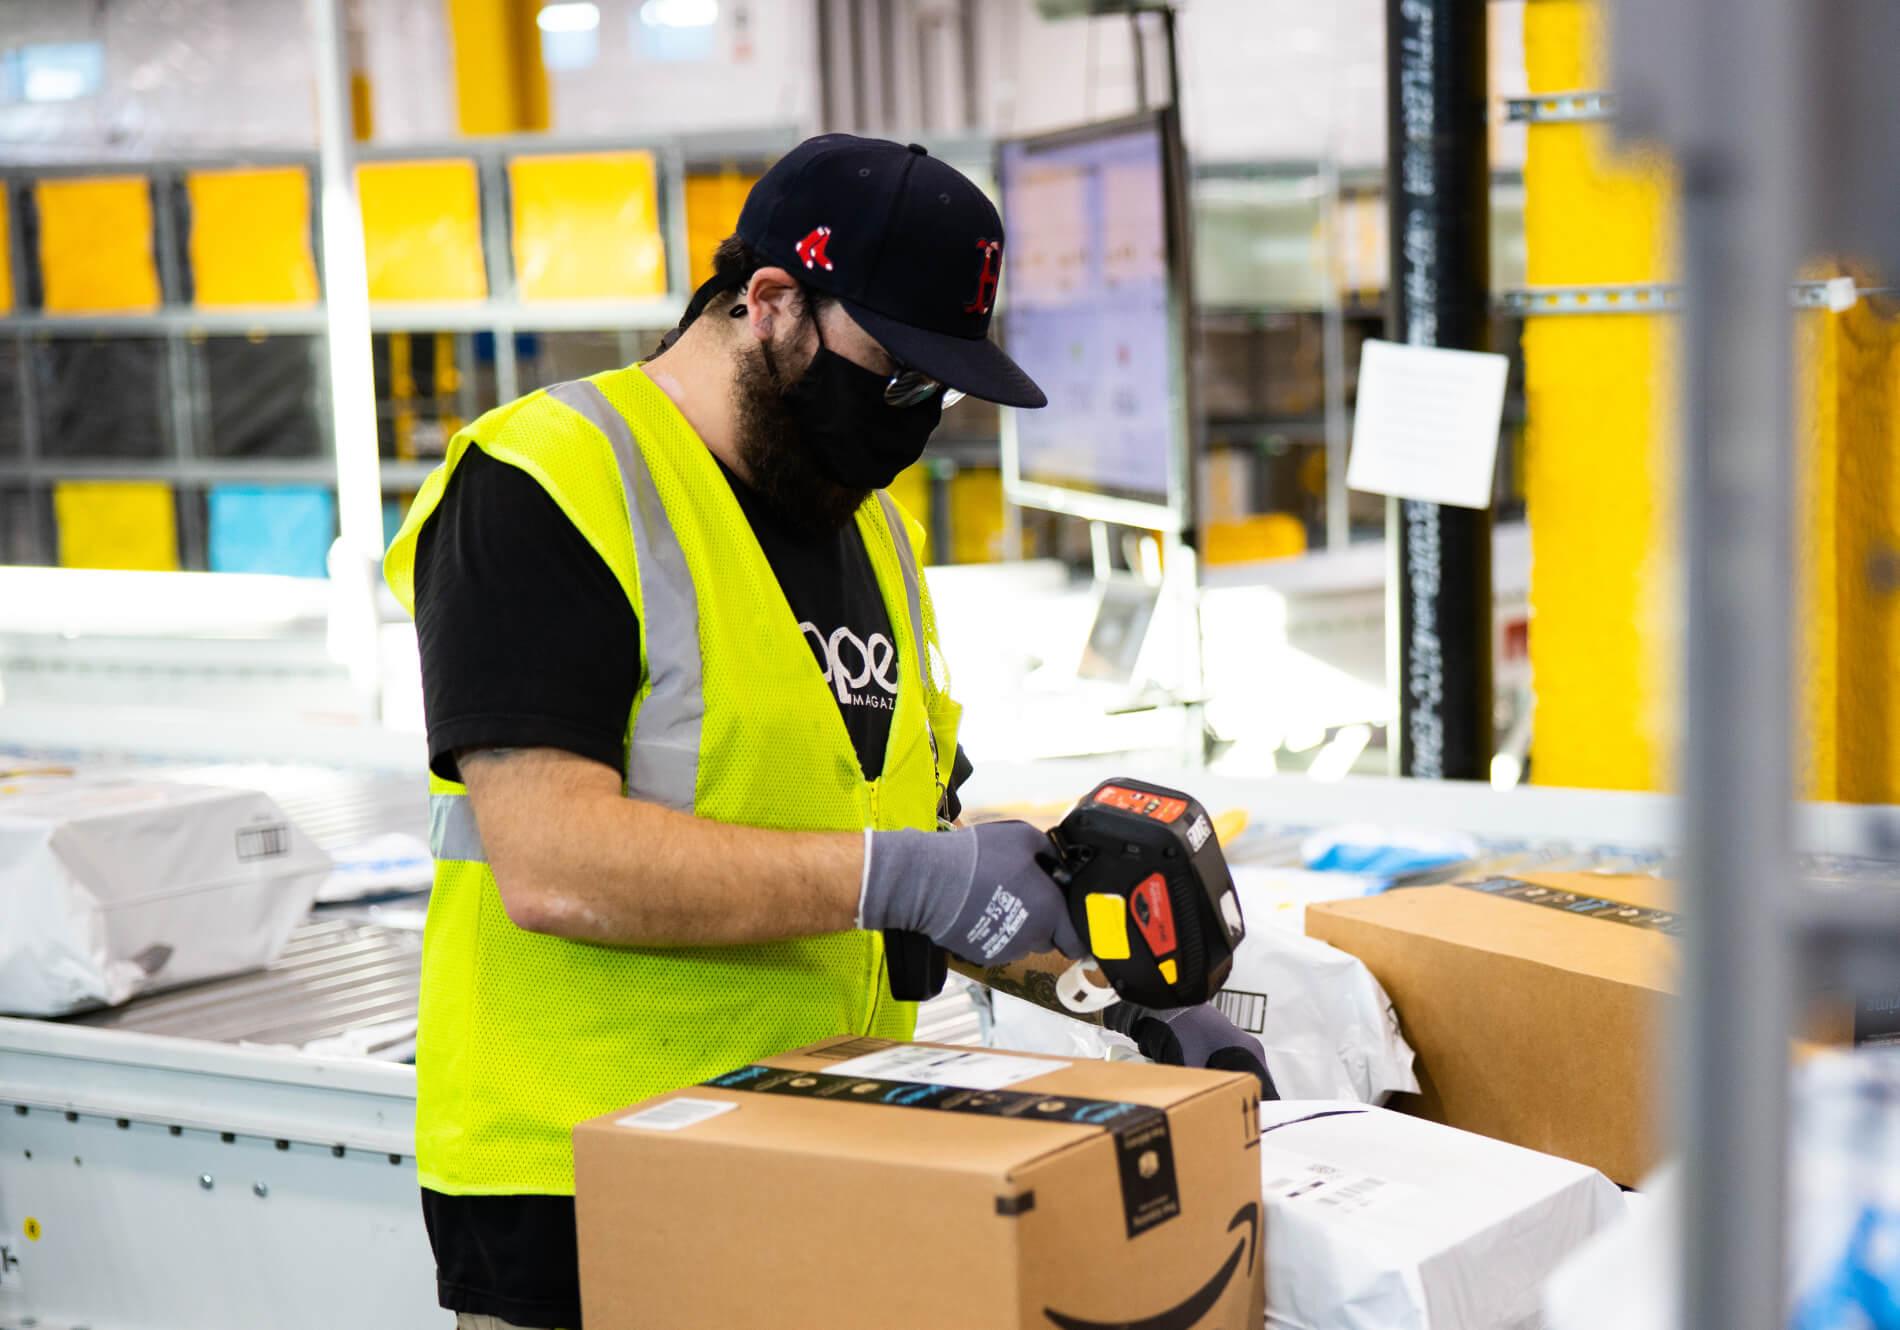 Amazon offers £1,000 bonus to warehouse operatives amid UK's staff shortage woes